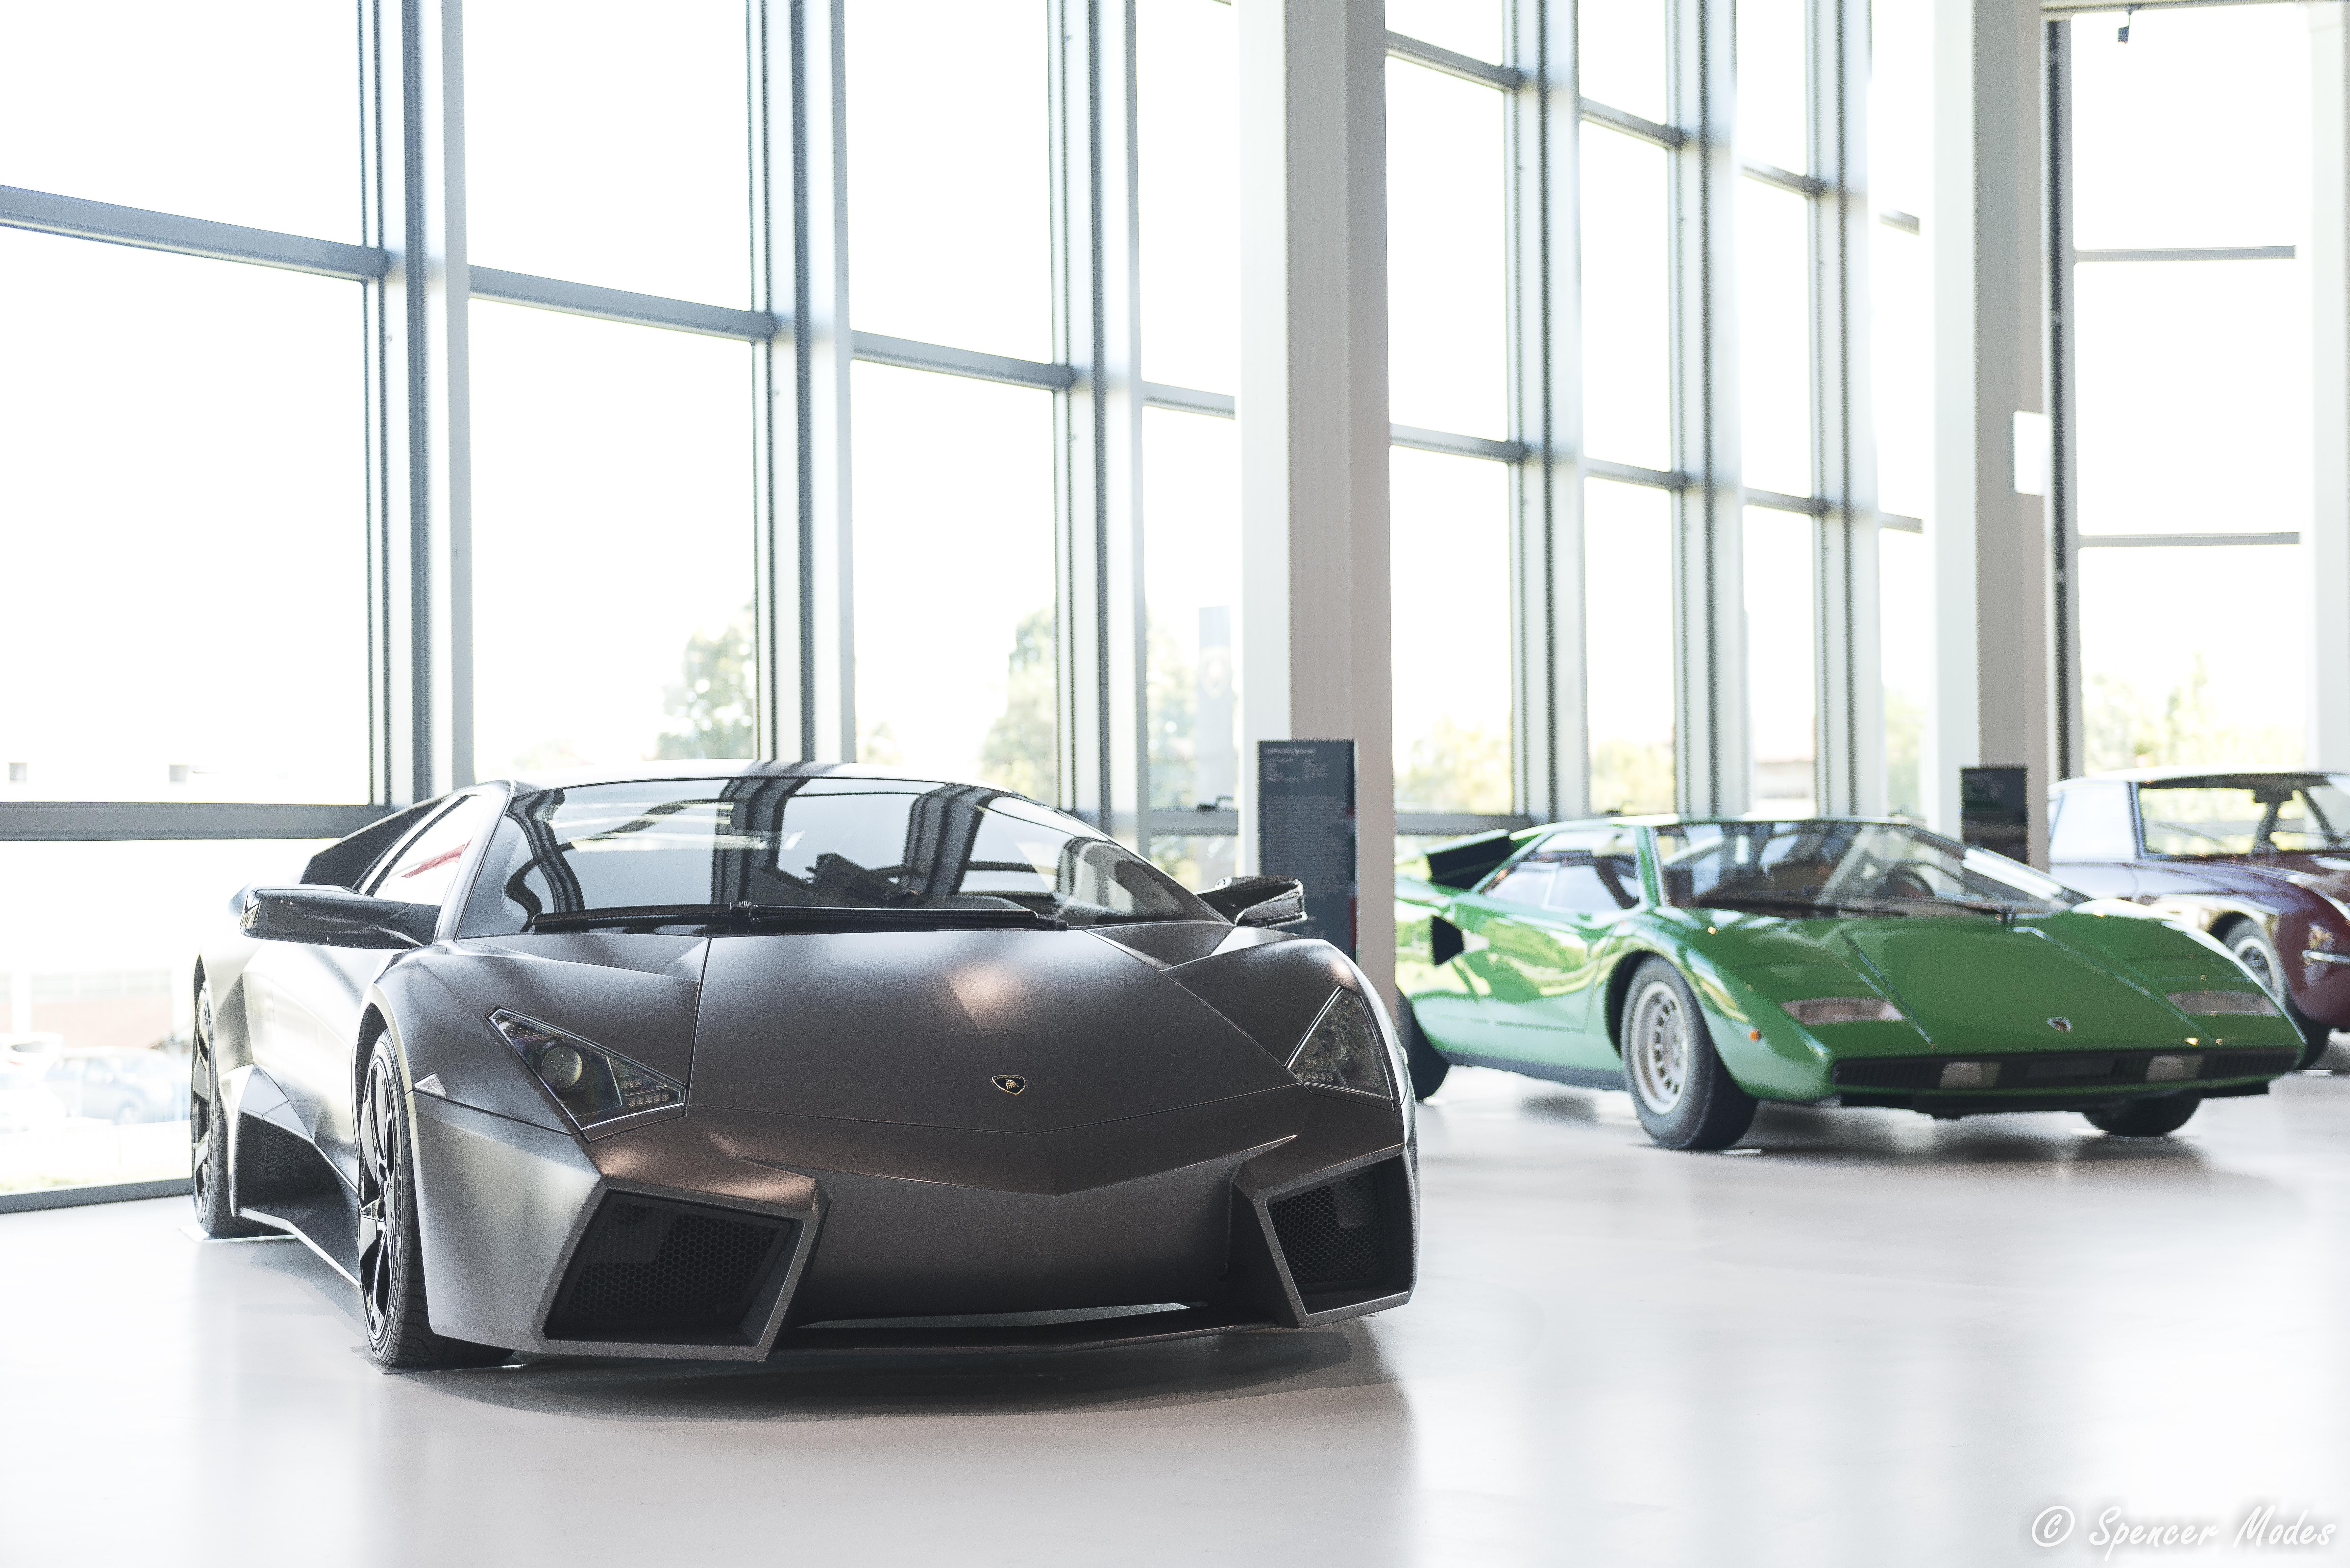 Wallpaper Italy Supercars Green Lamborghini Aventador